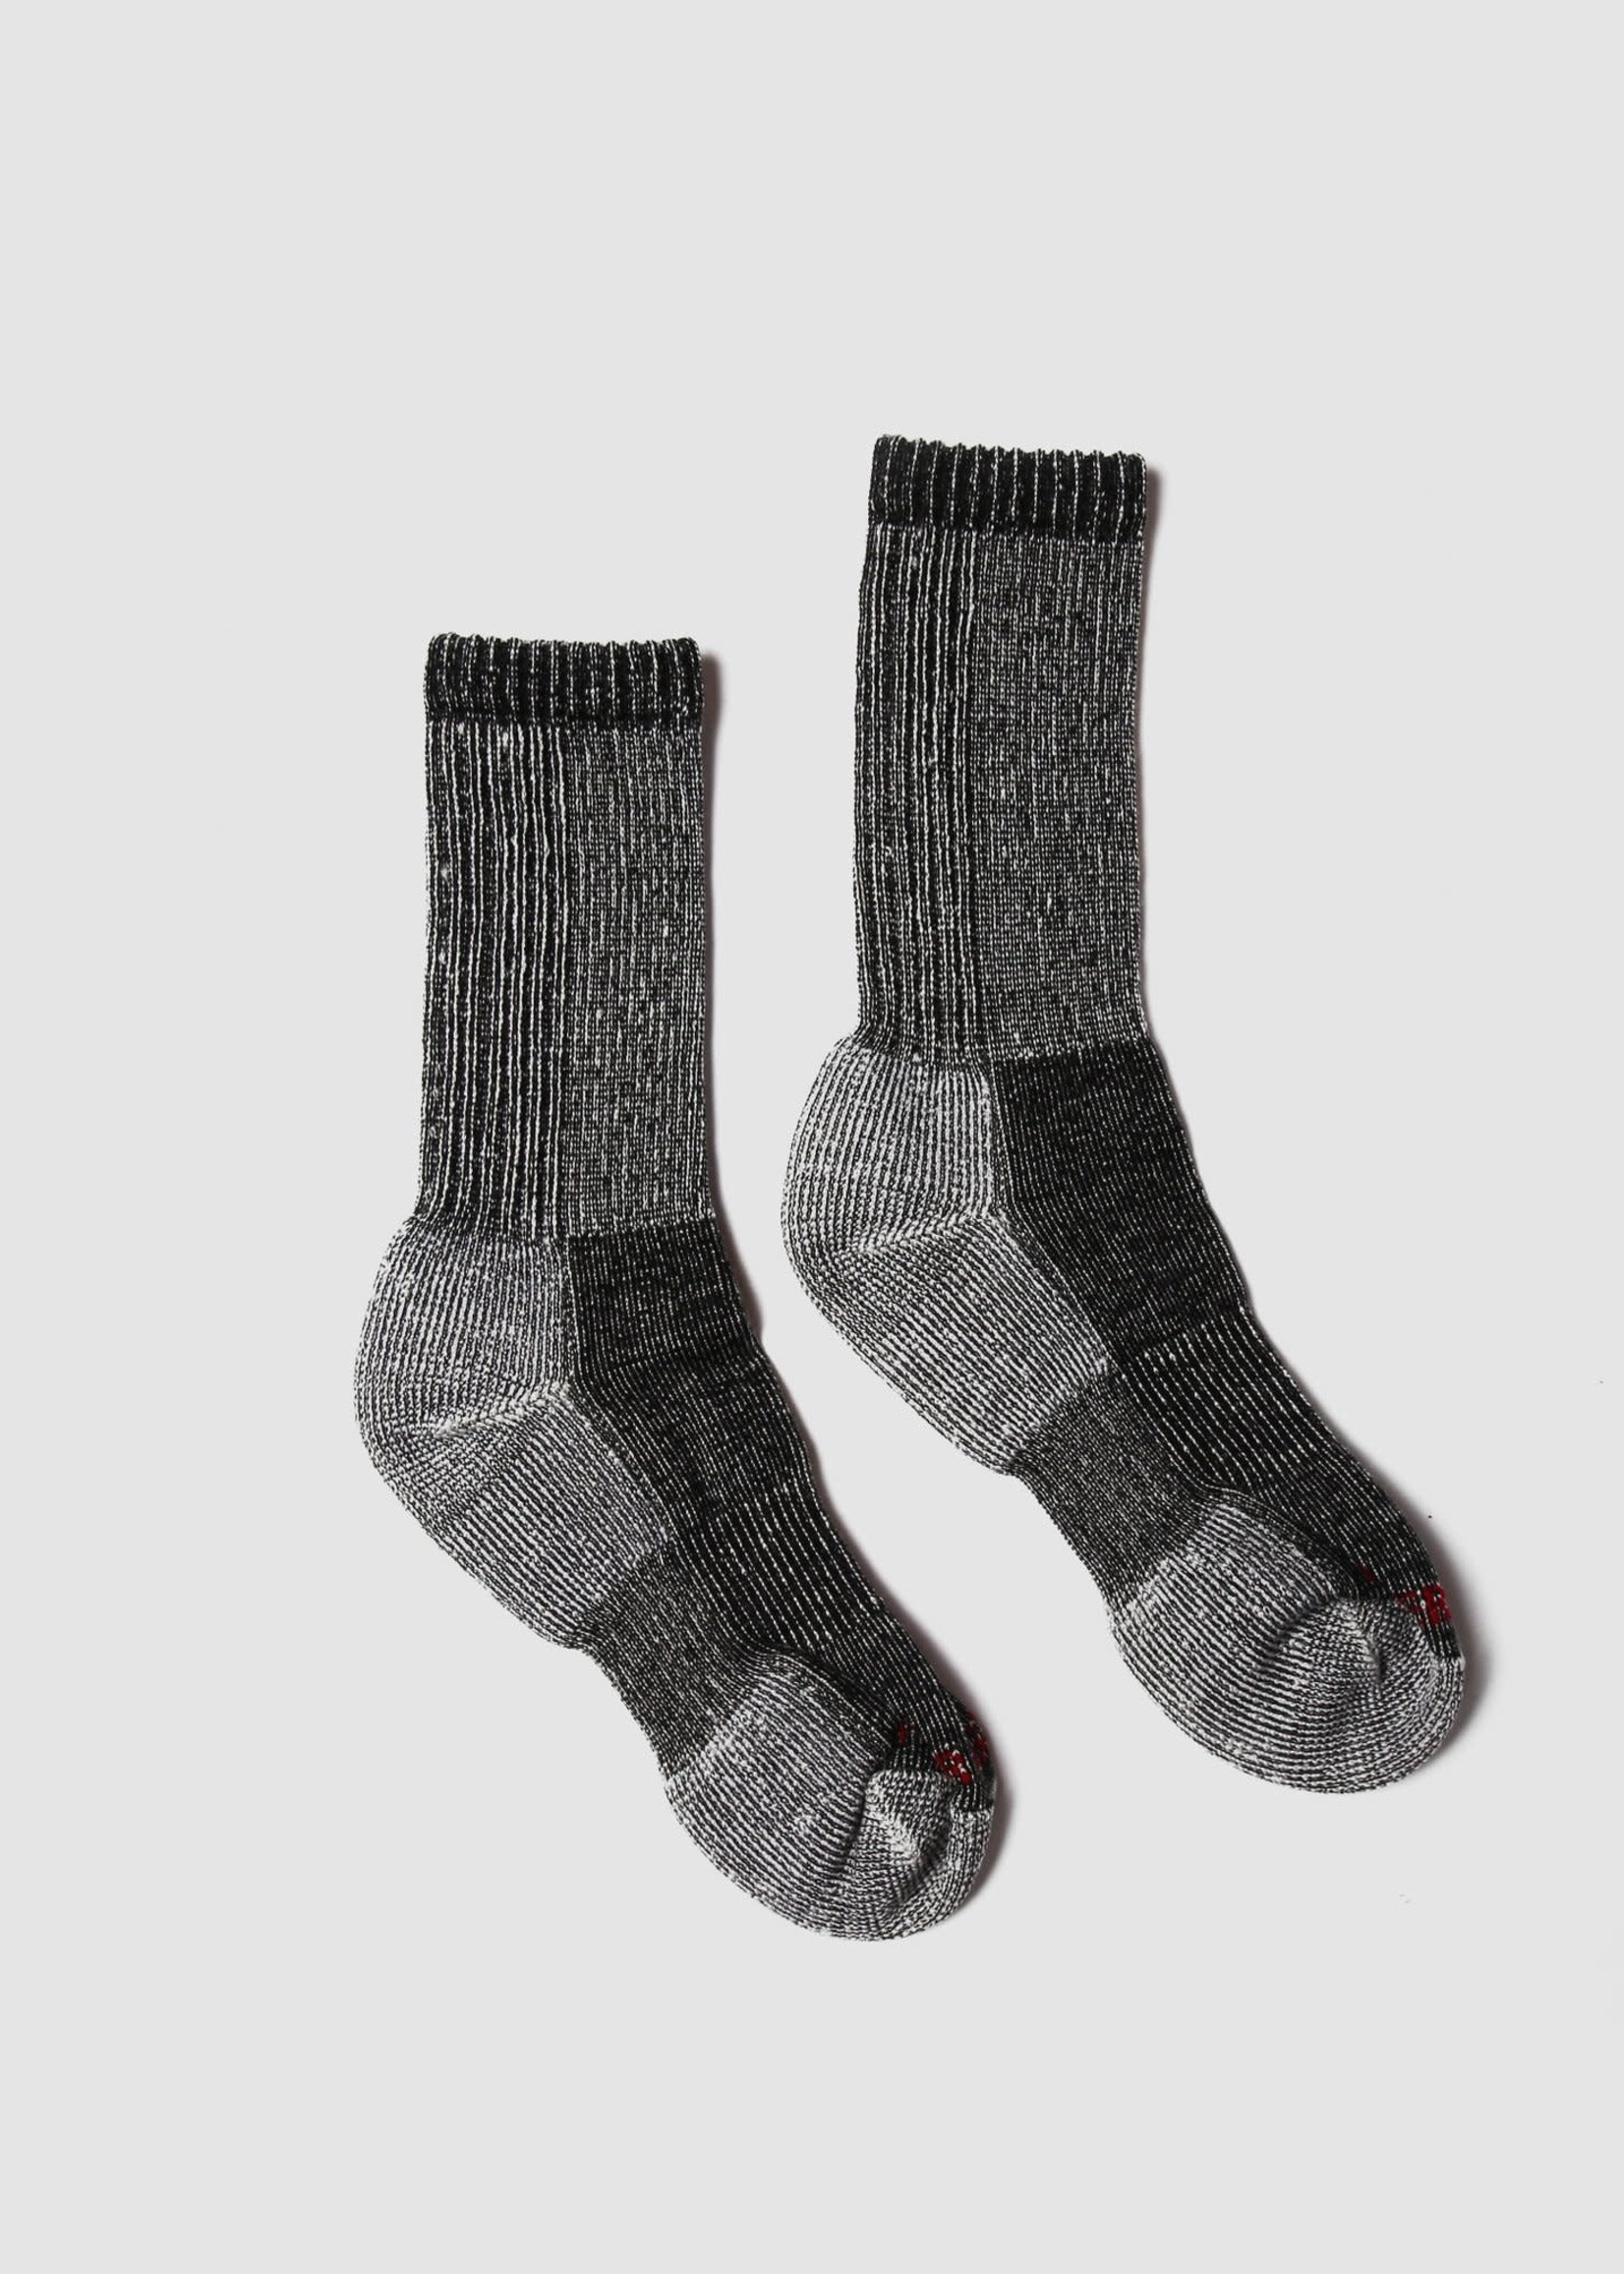 Muttonhead Muttonhead Merino Hiking Socks